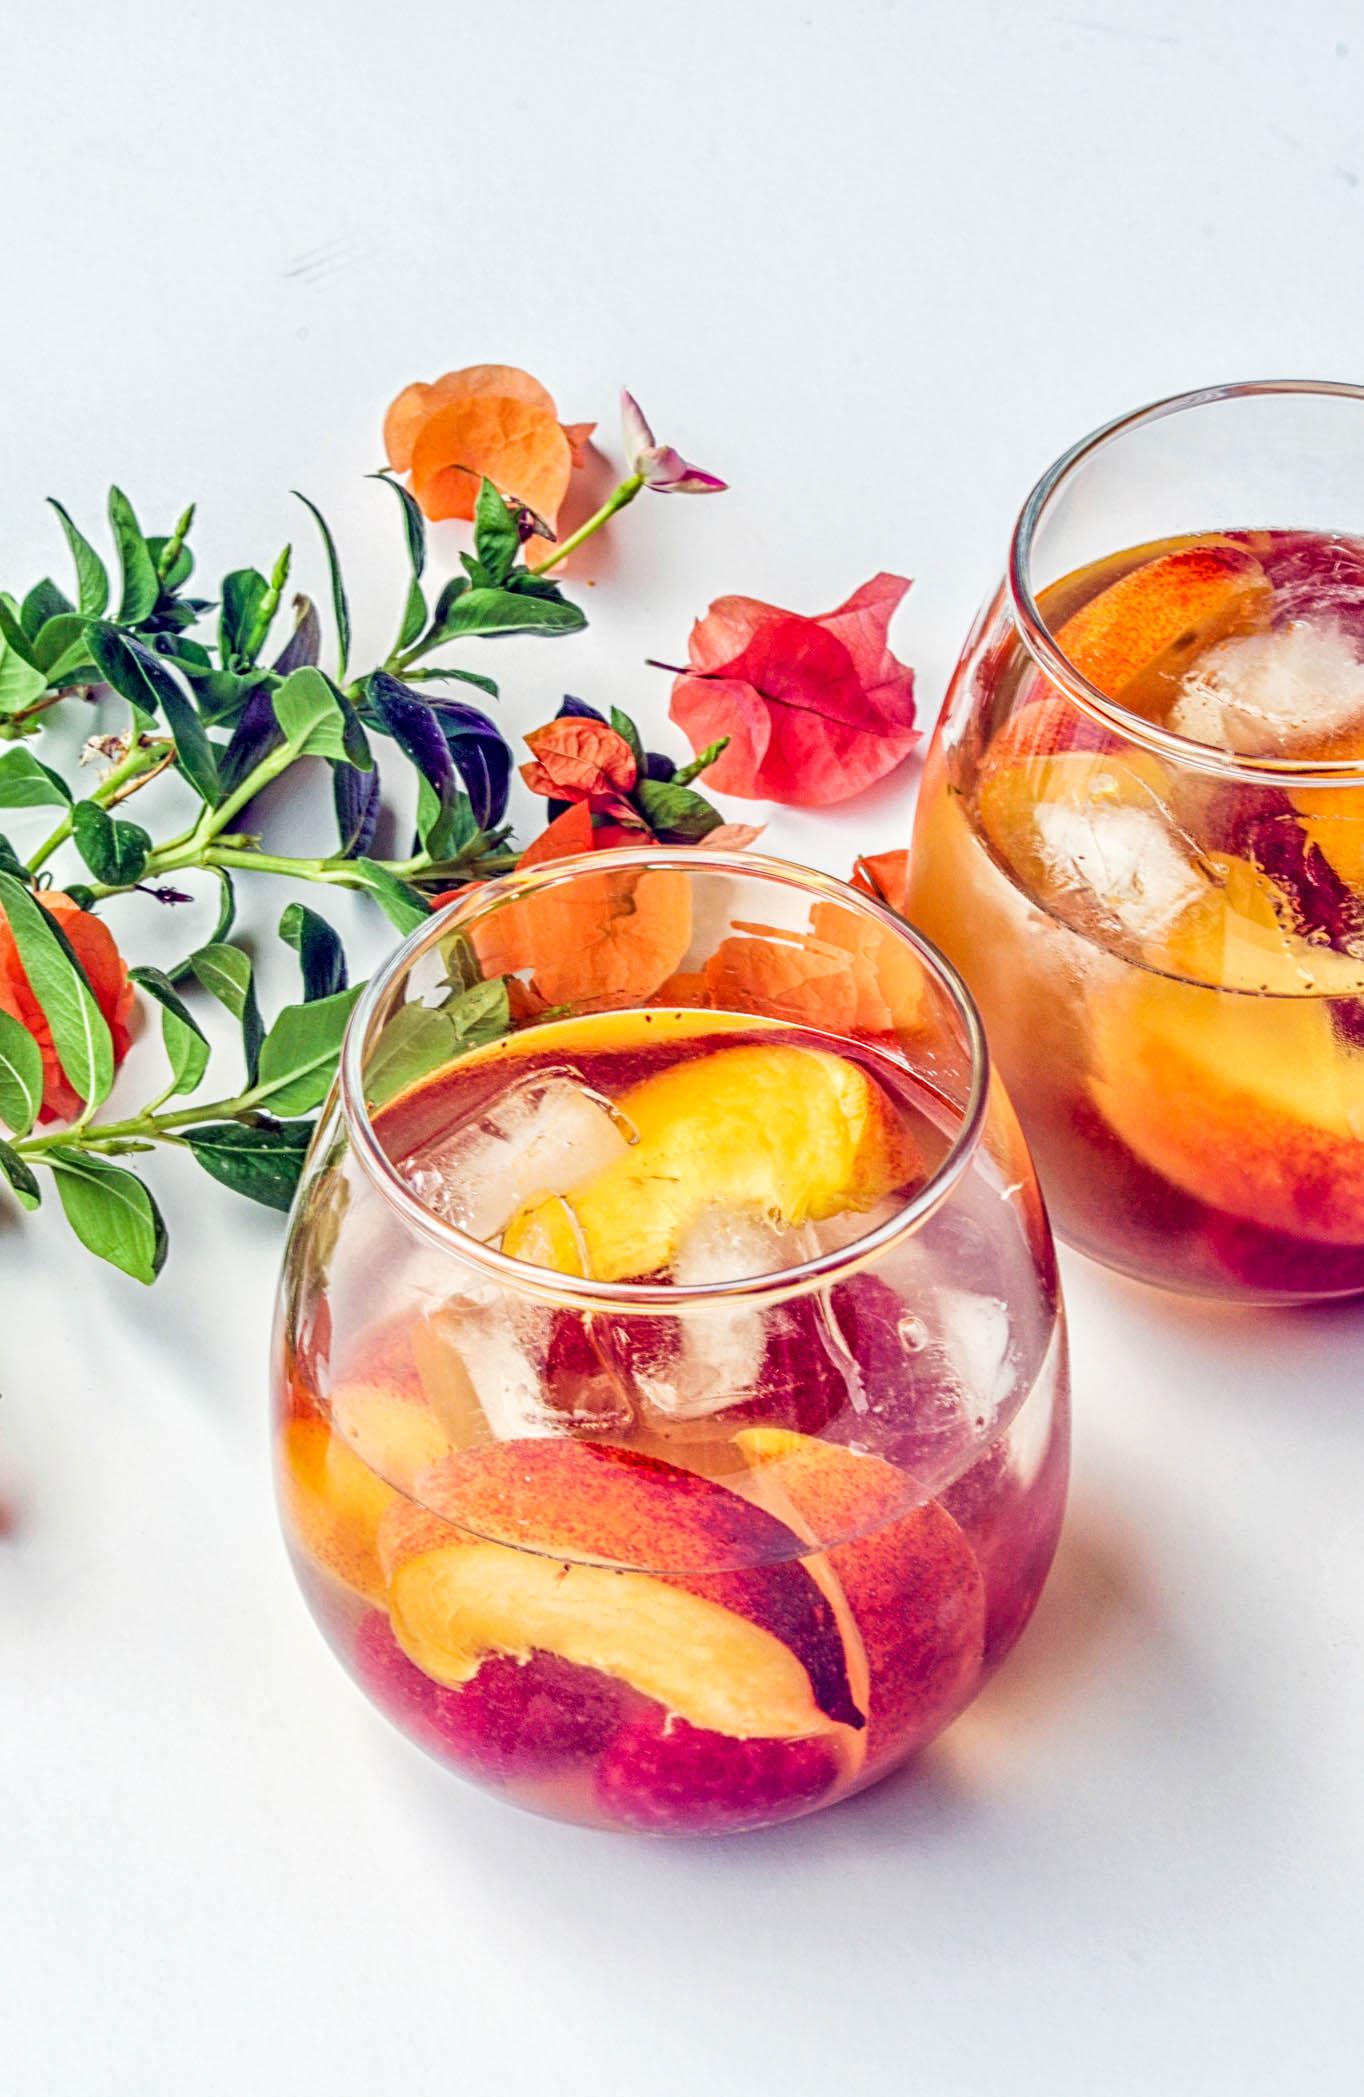 Peach & Raspberry Sangria - made with Sauvignon Blanc - a delicious, summery drink recipe.